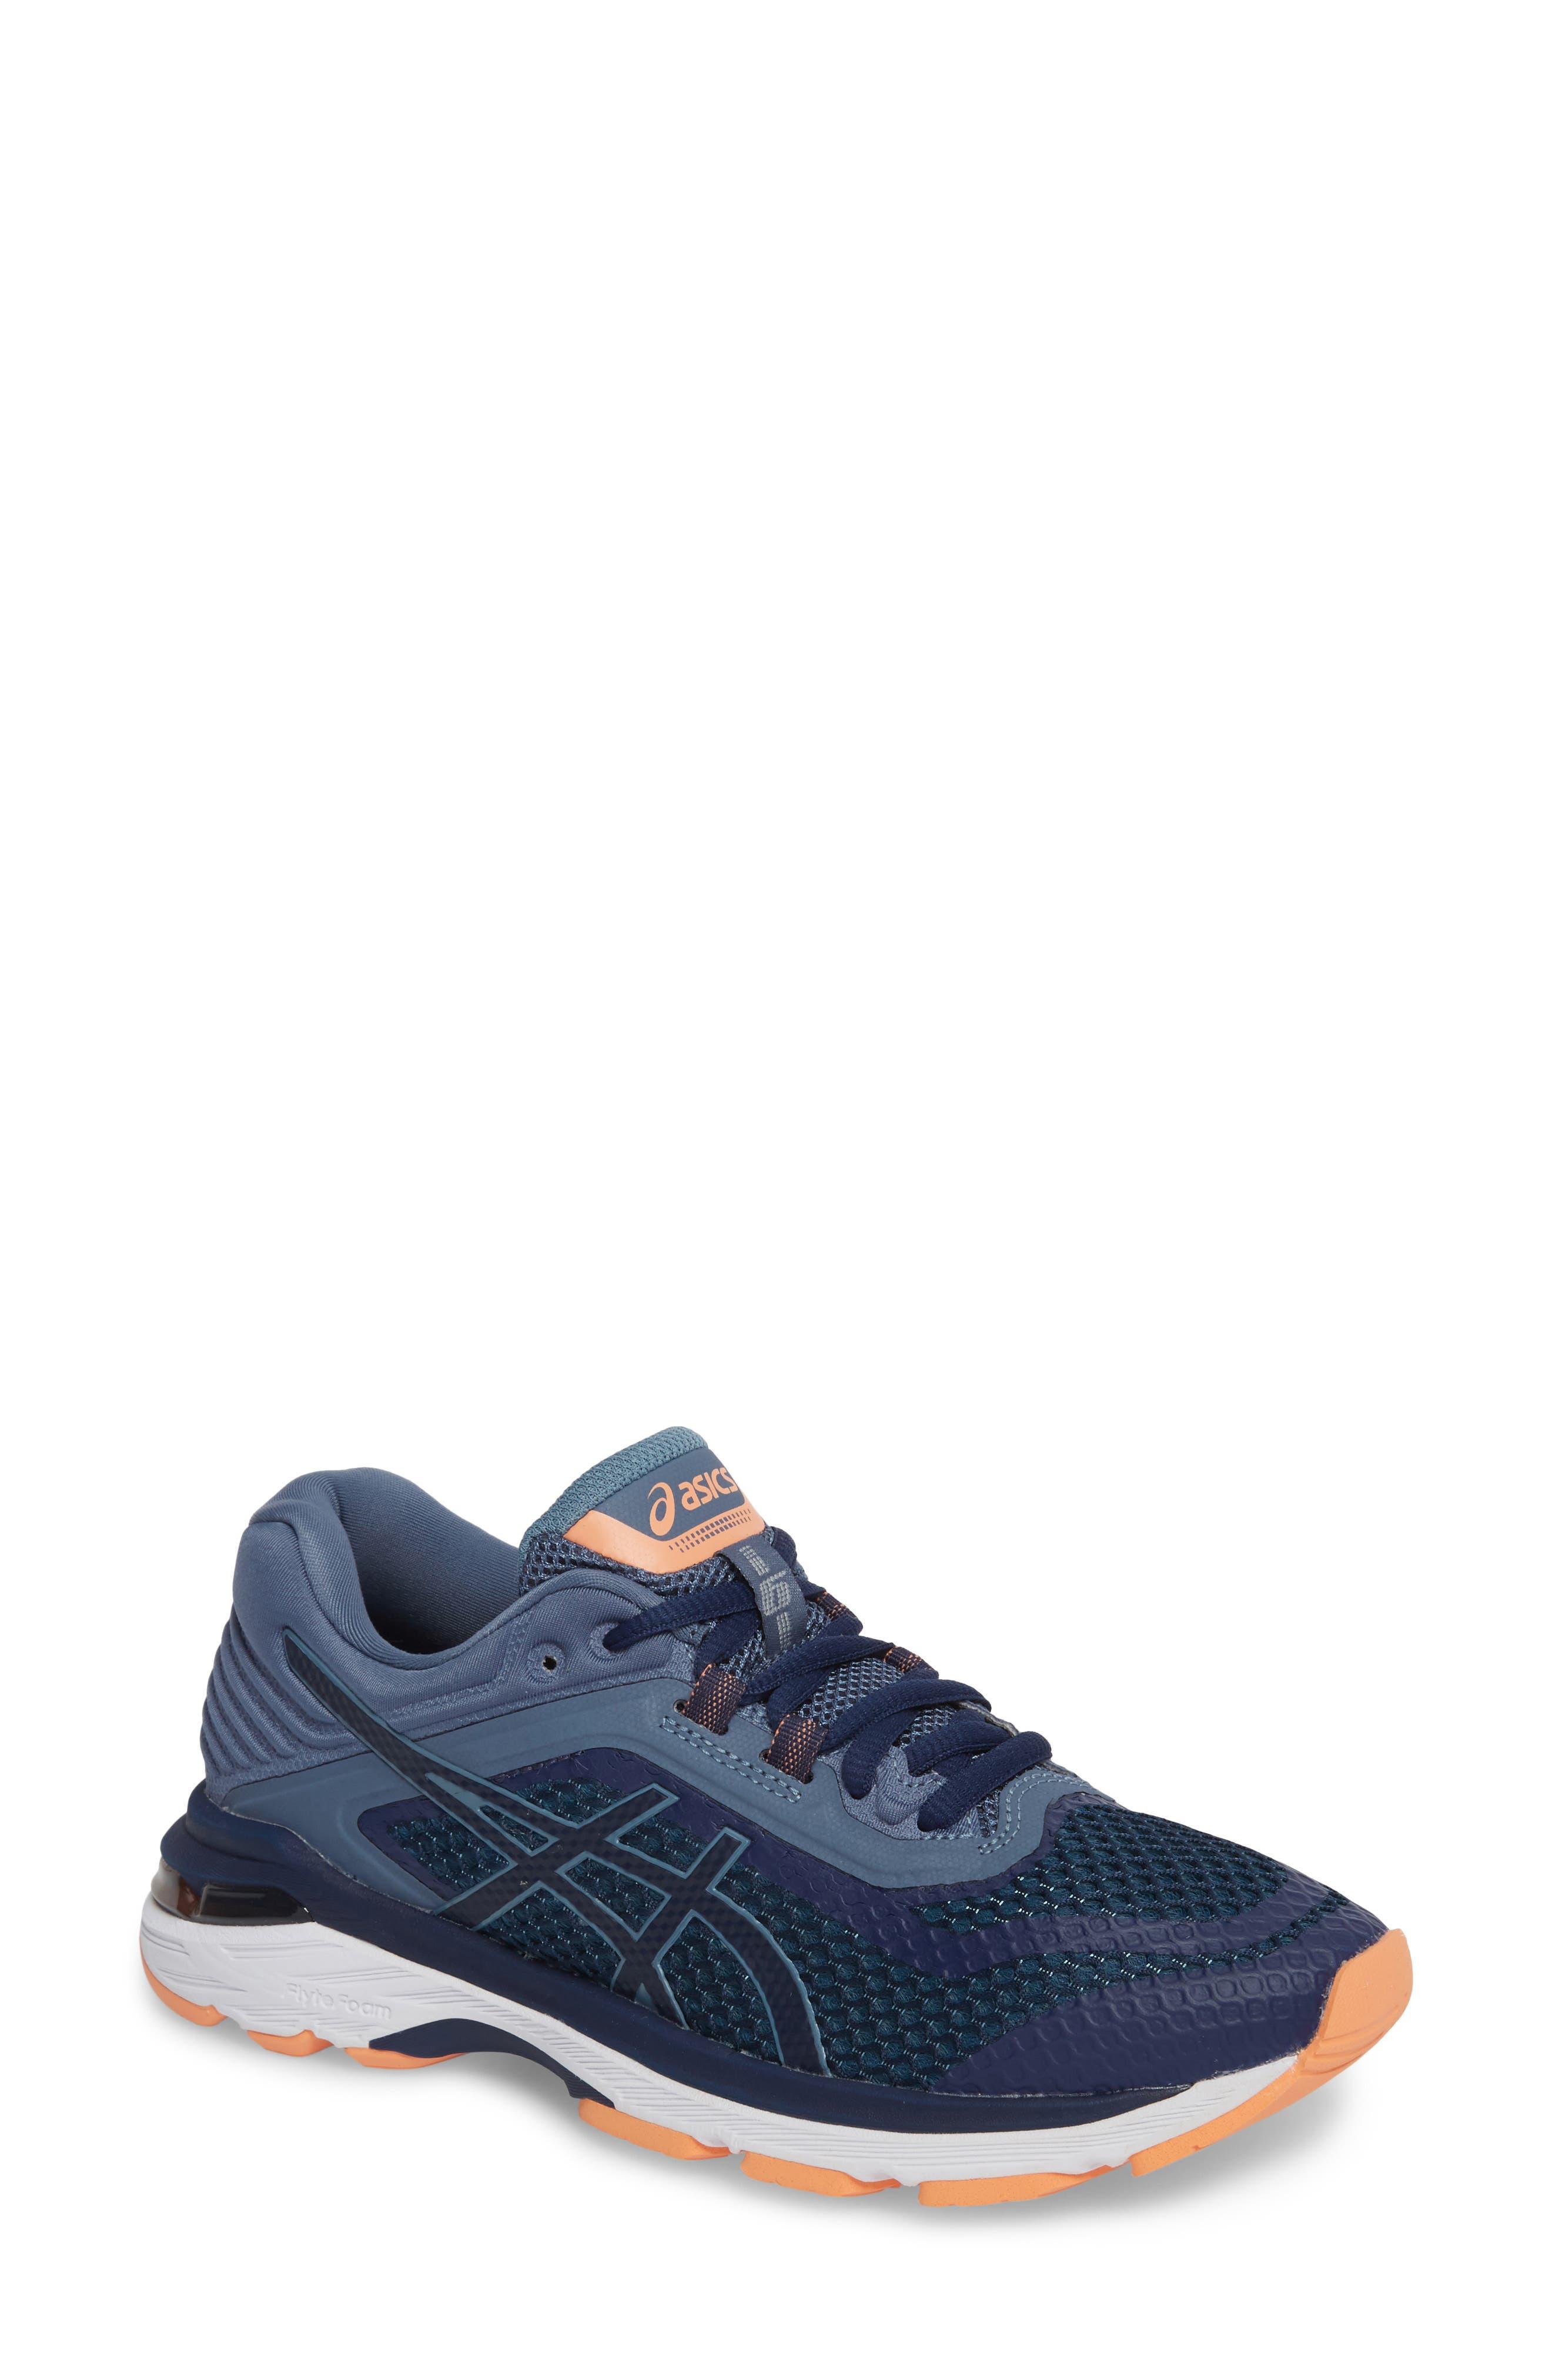 GT-2000 6 Running Shoe,                         Main,                         color, Indigo Blue/ Smoke Blue